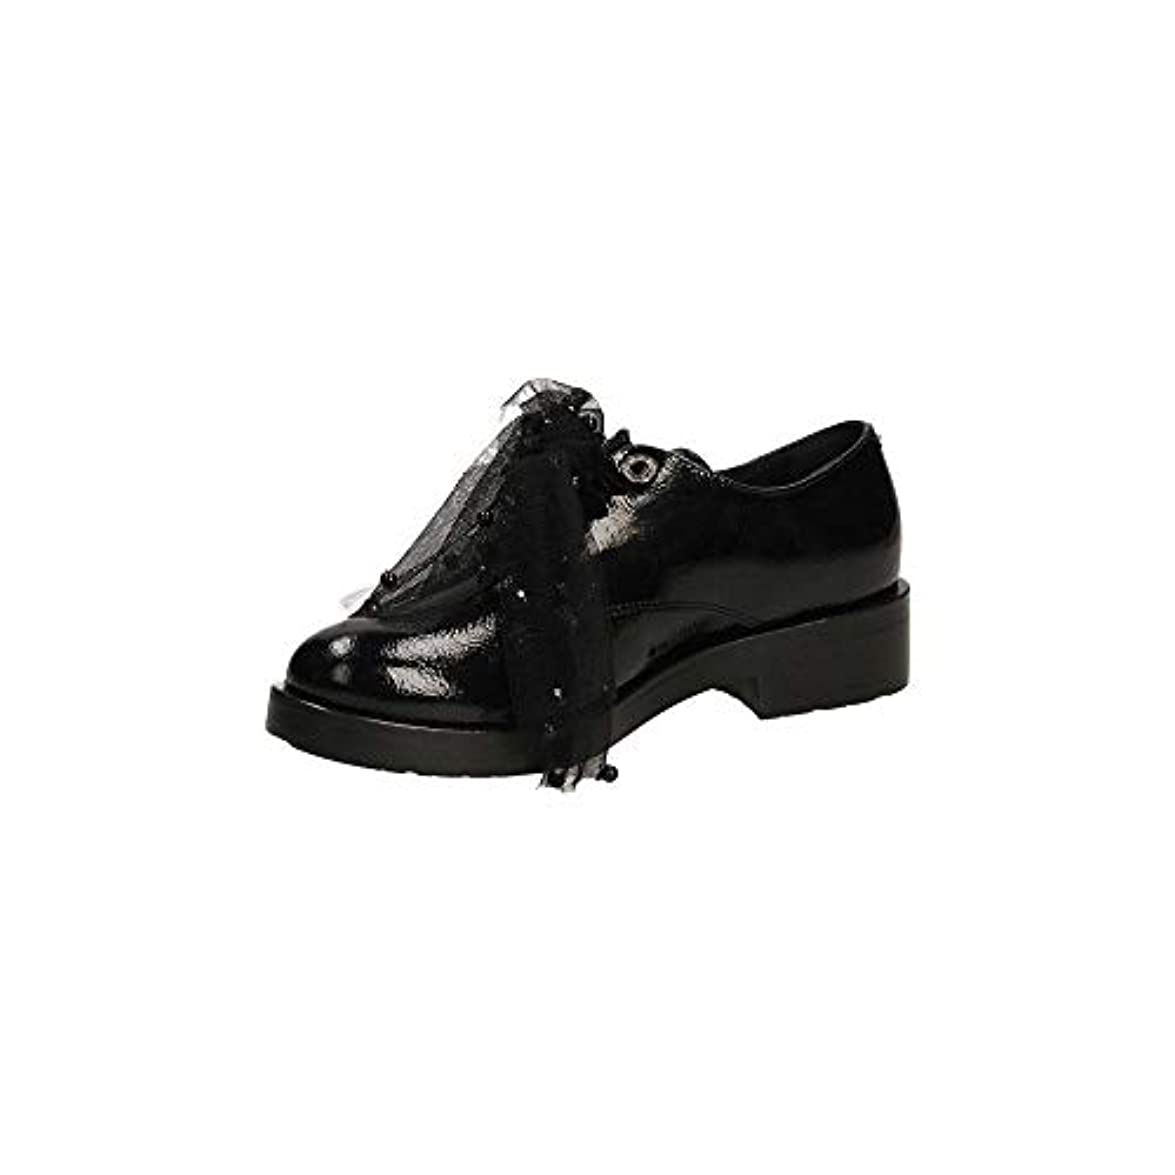 Toscablu Shoes Calzature Stringate Sf1812s229 c99